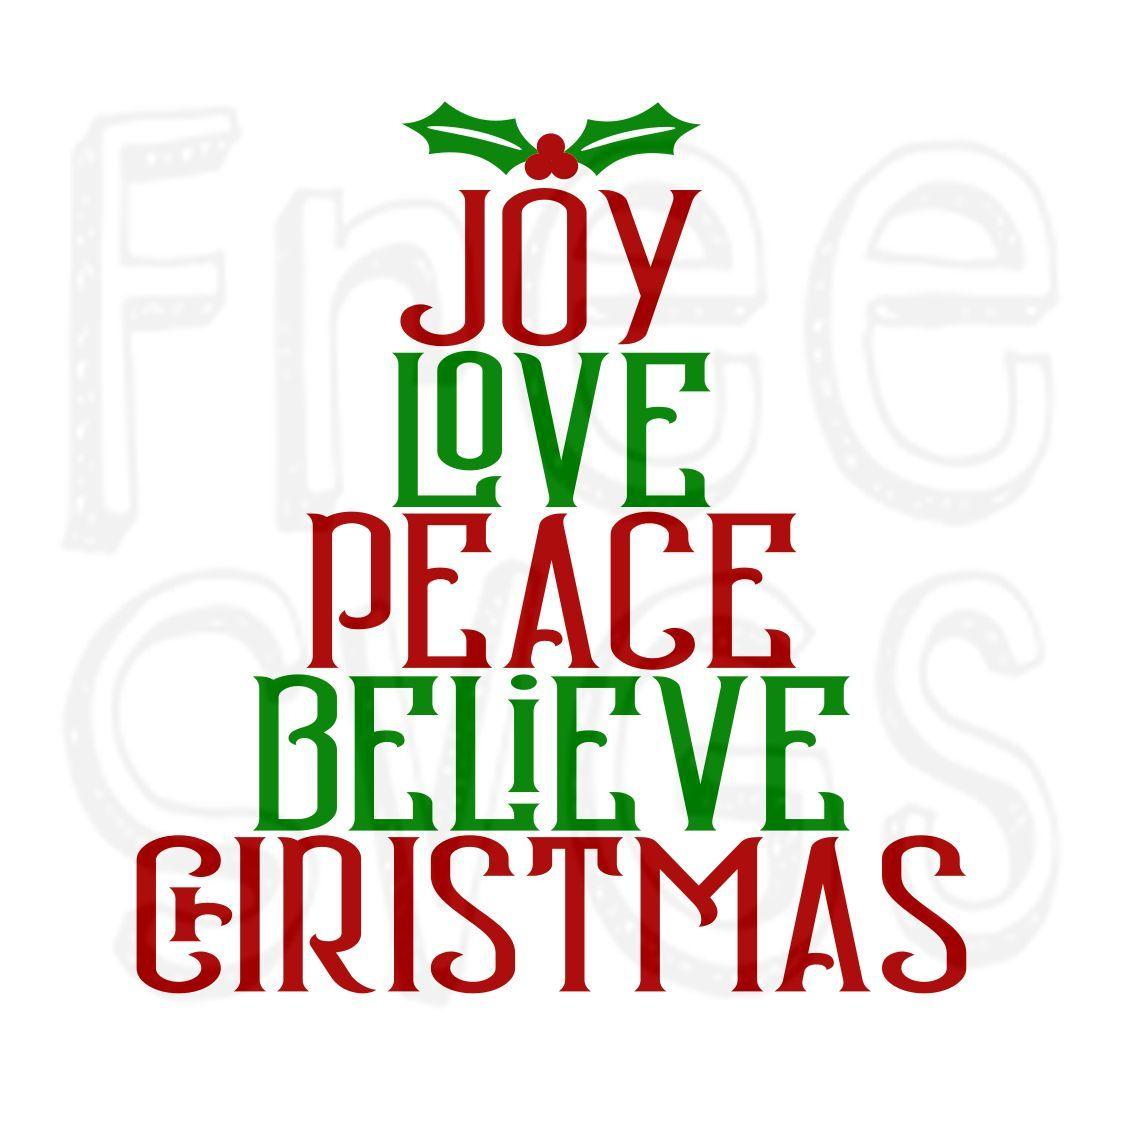 Download Joy Love Peace Believe Christmas SVG File | XMAS CARDS ...